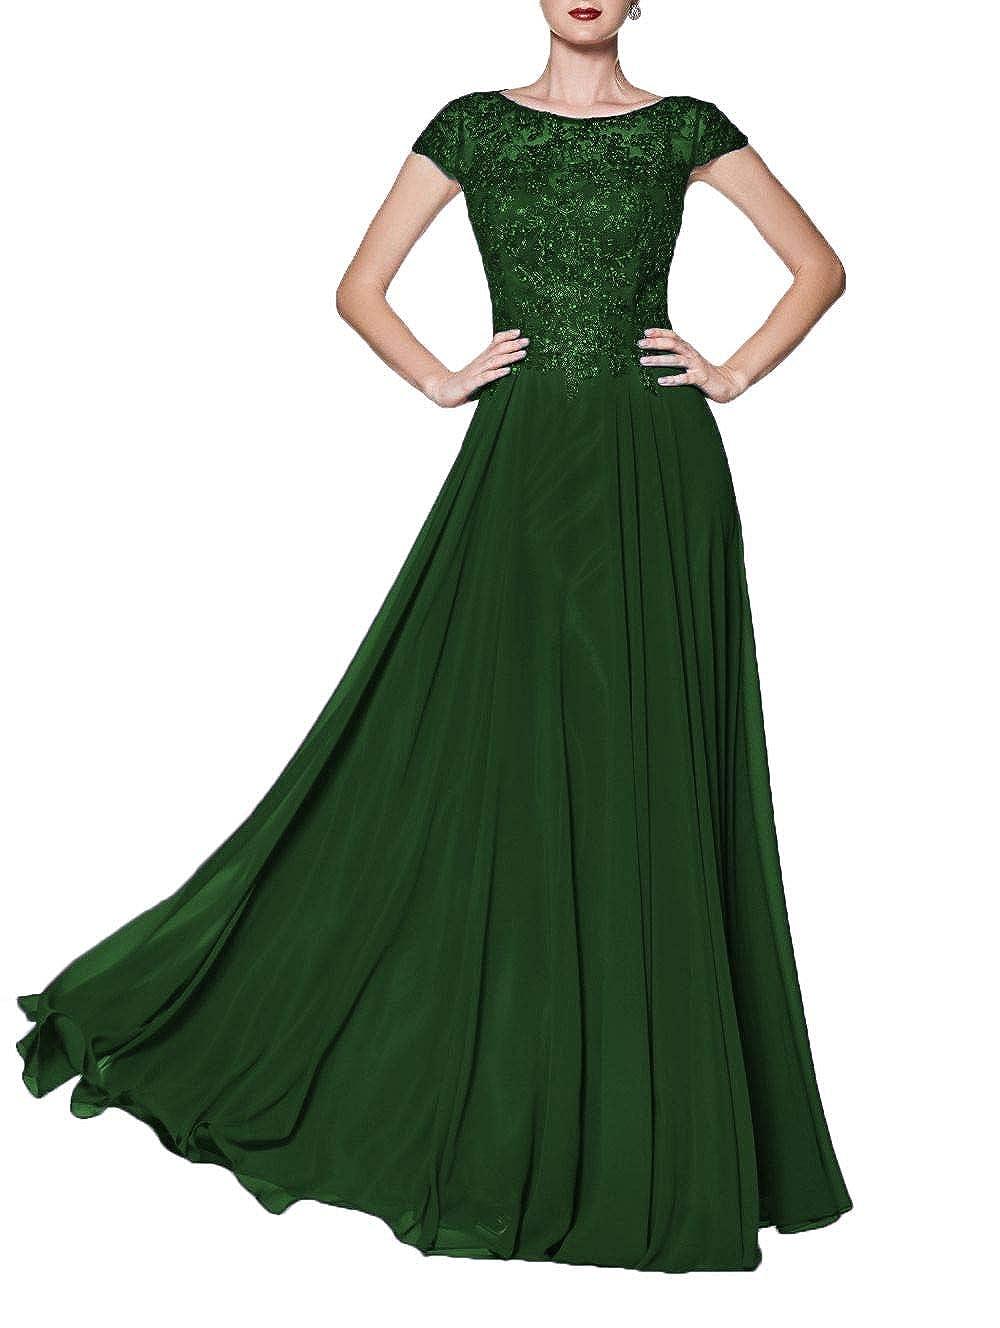 Dark Green Wanshaqin Women's Illusion Neckline Jeweled Waist Long Evening Gown Prom Formal Dress Bridesmaid Gown